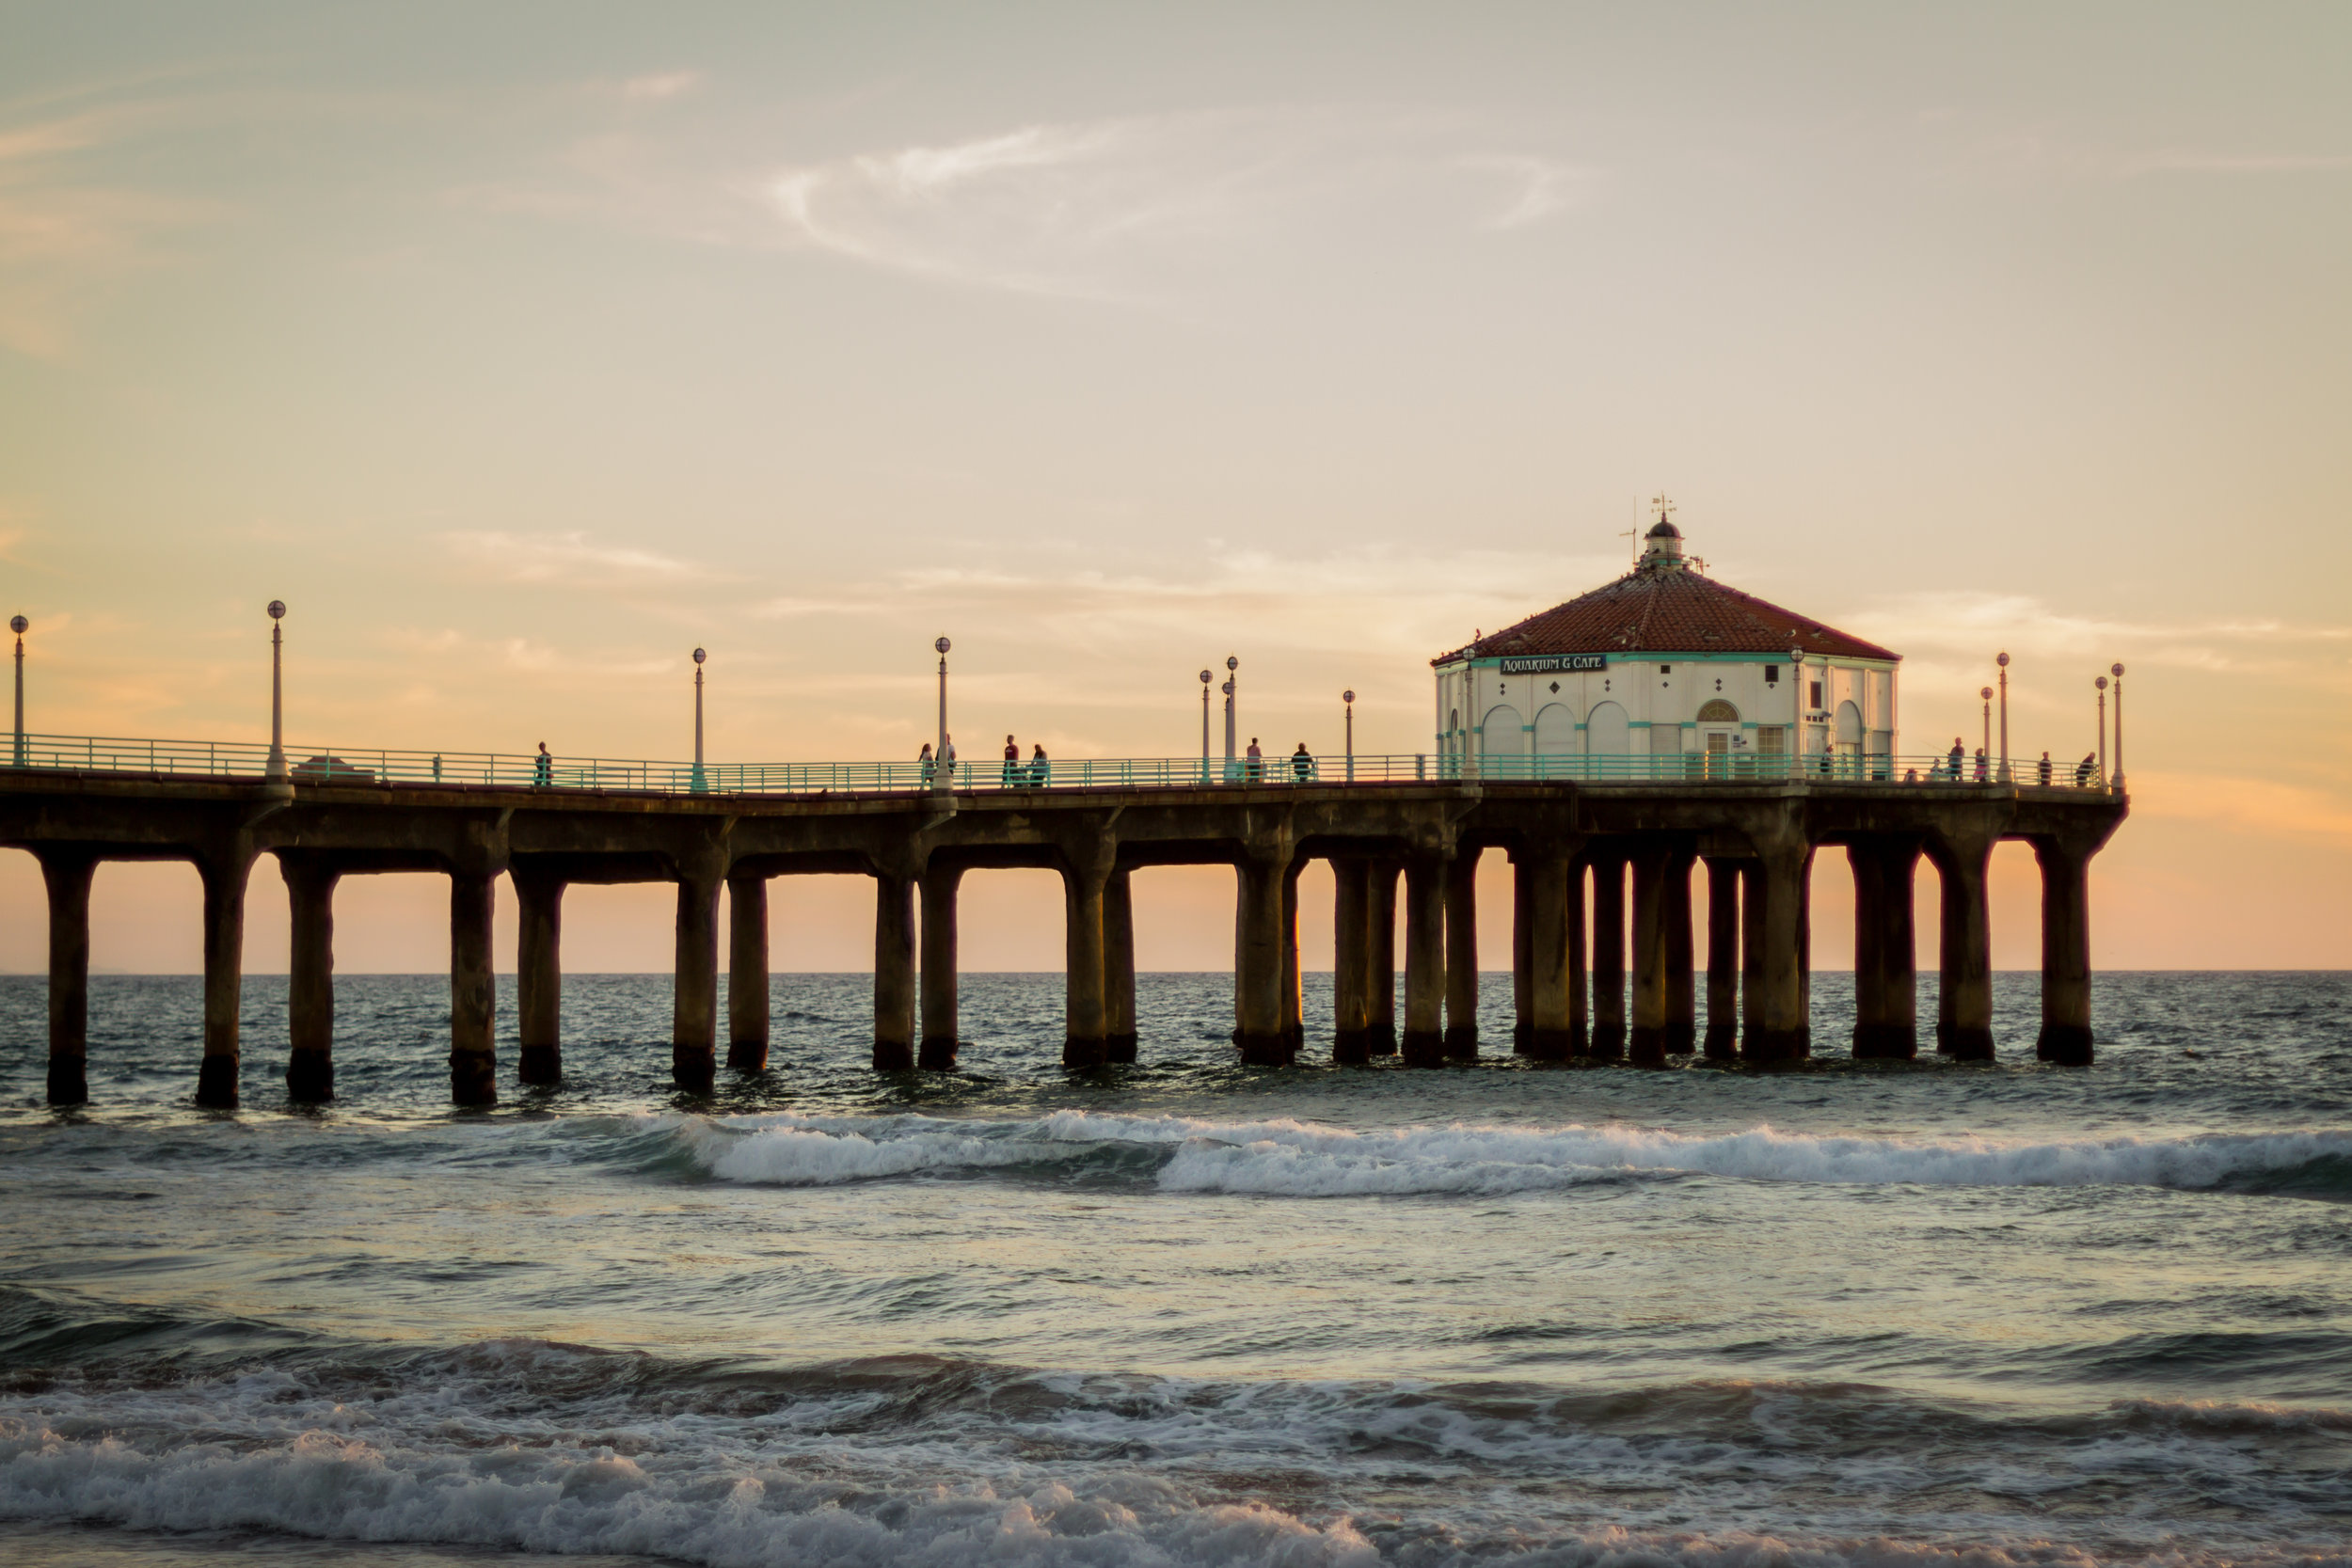 Manhattan Beach Pier - a South Bay must for portraits